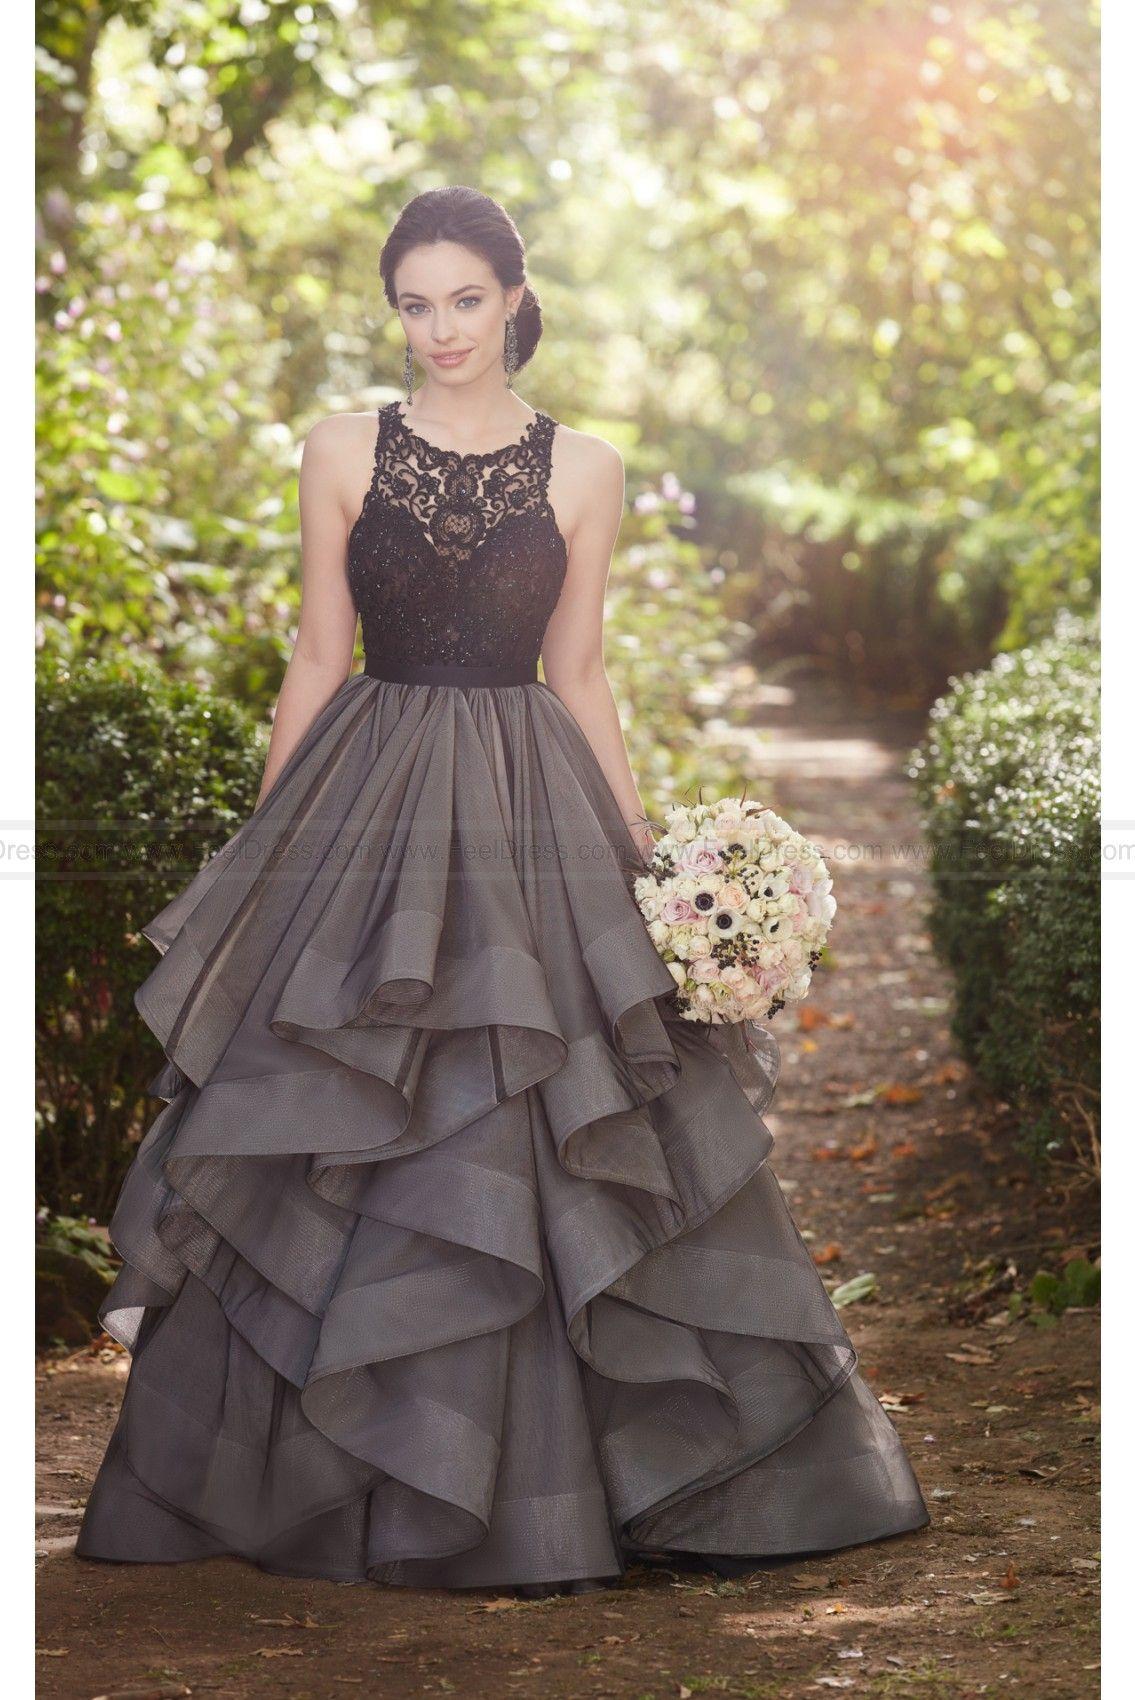 Martina liana black ball gown wedding dress separates style brody